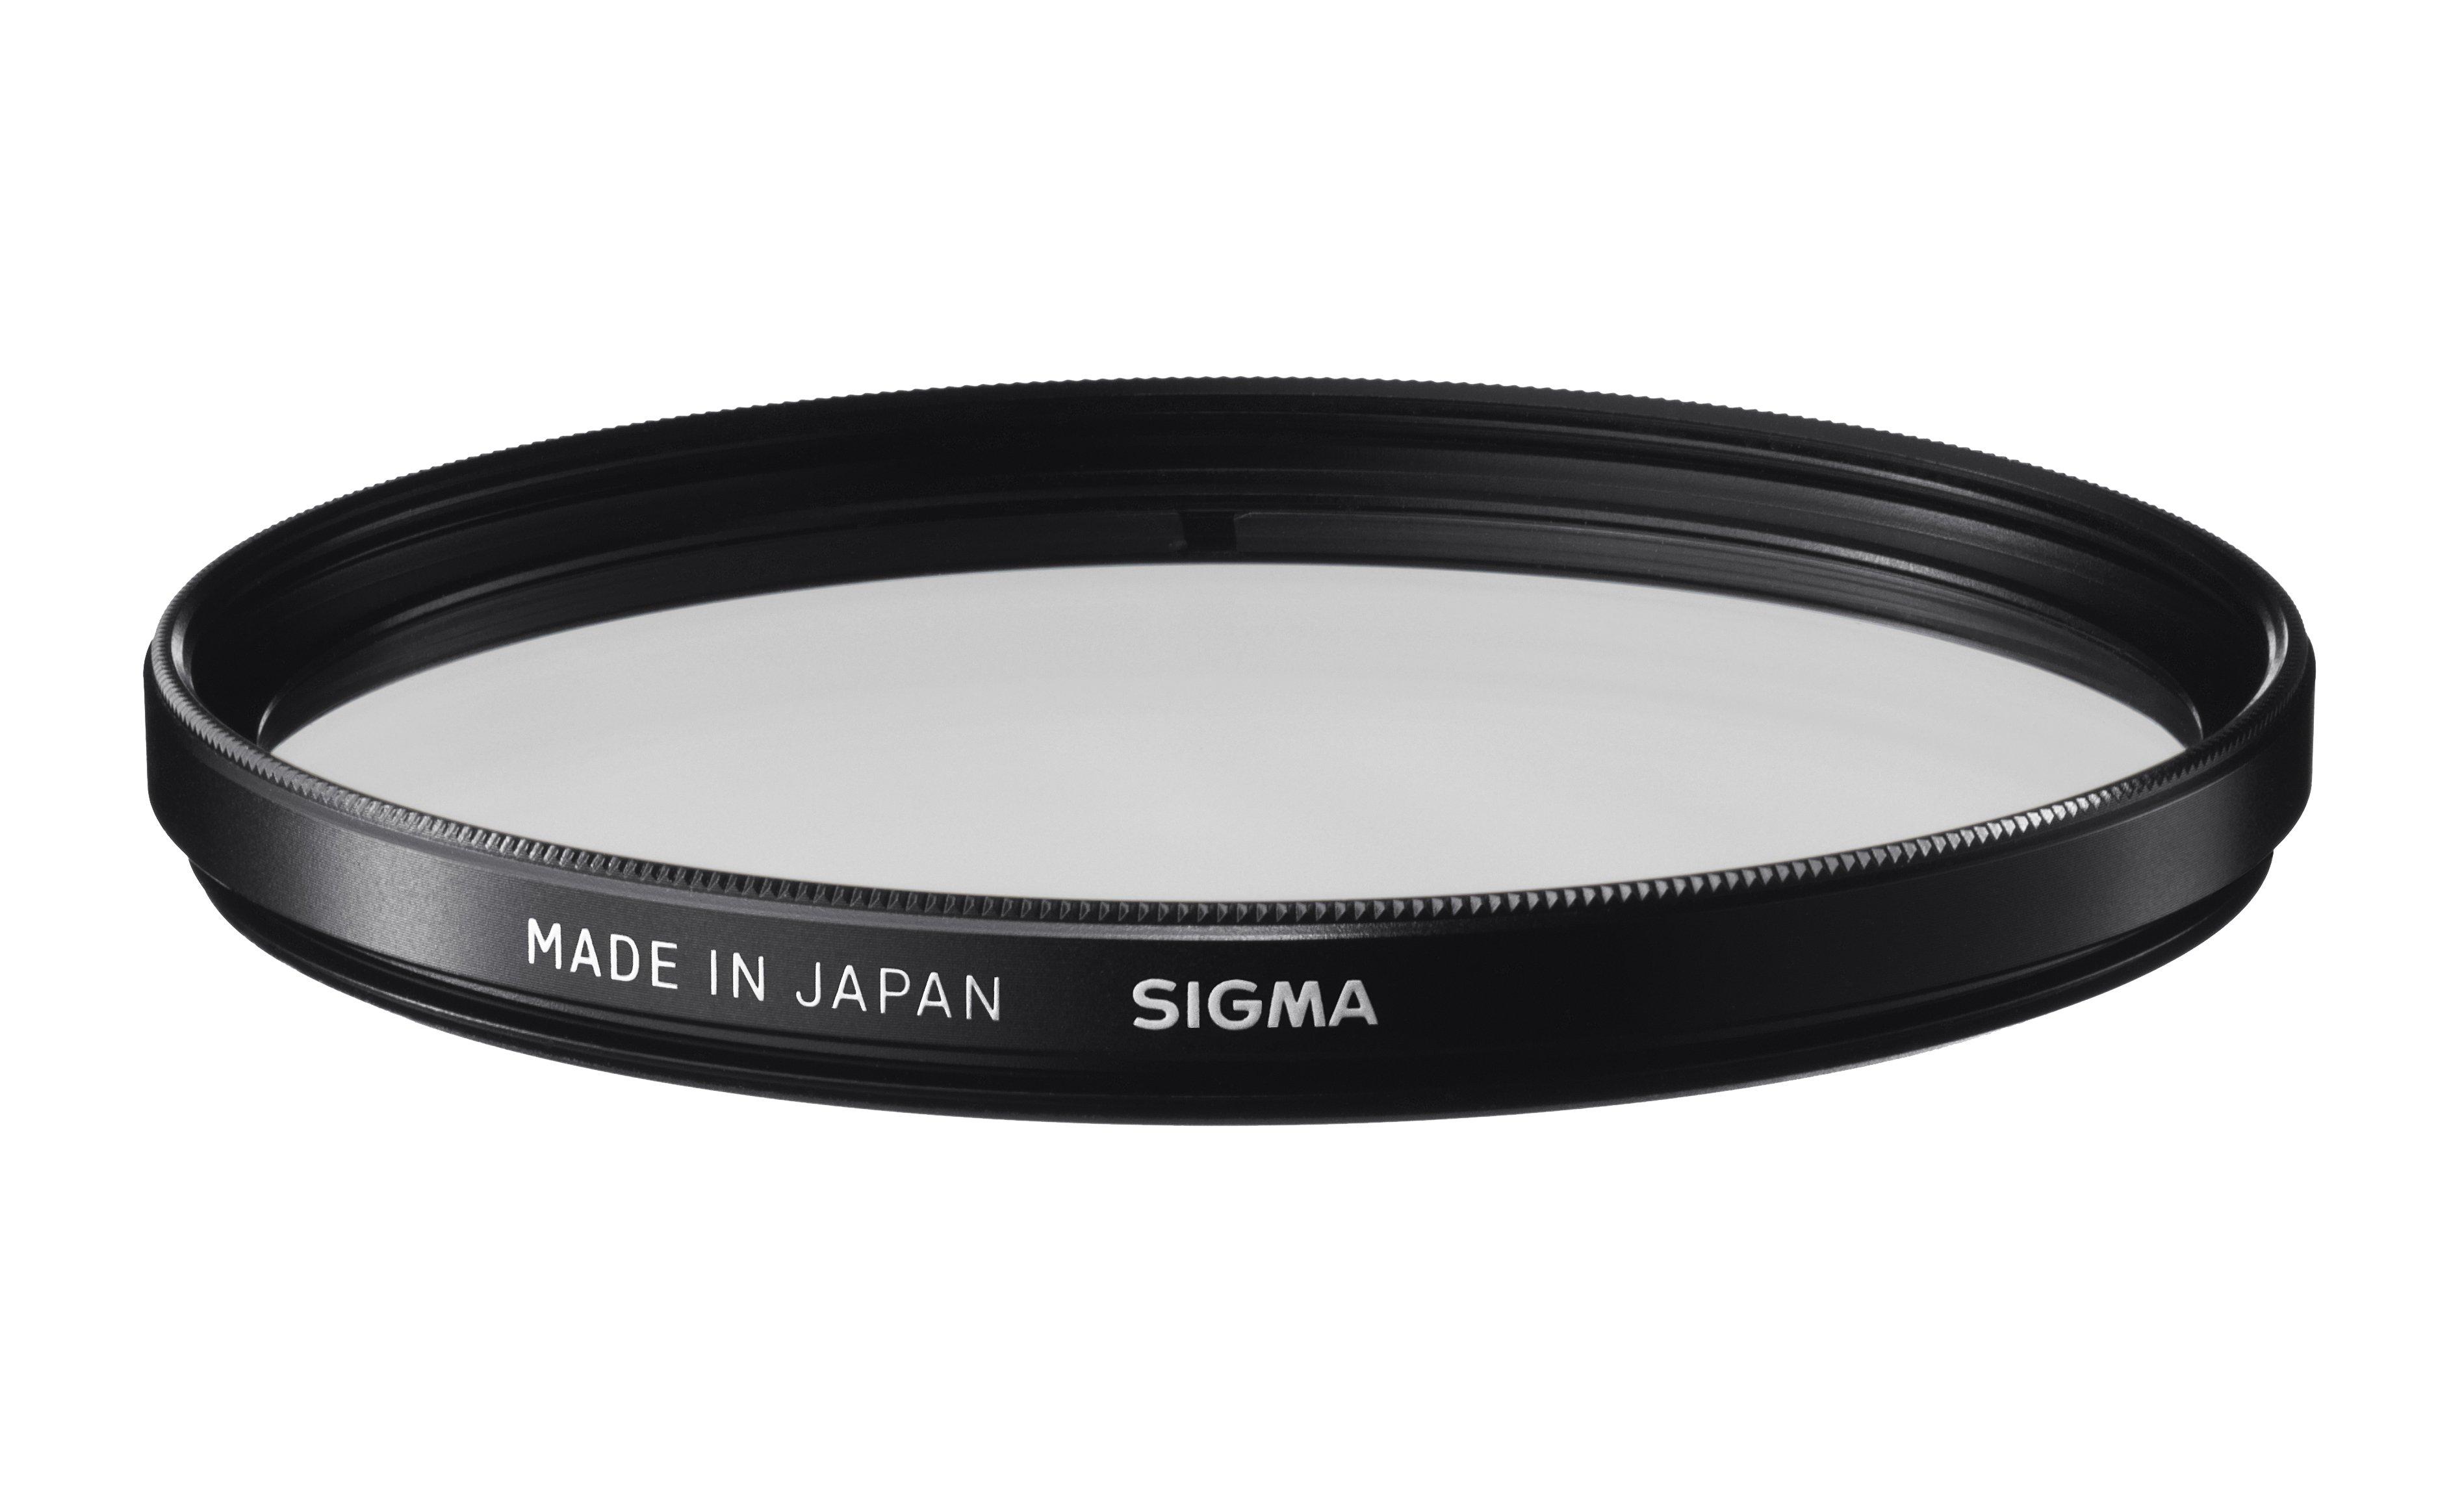 SIGMA filtr UV 58 mm WR